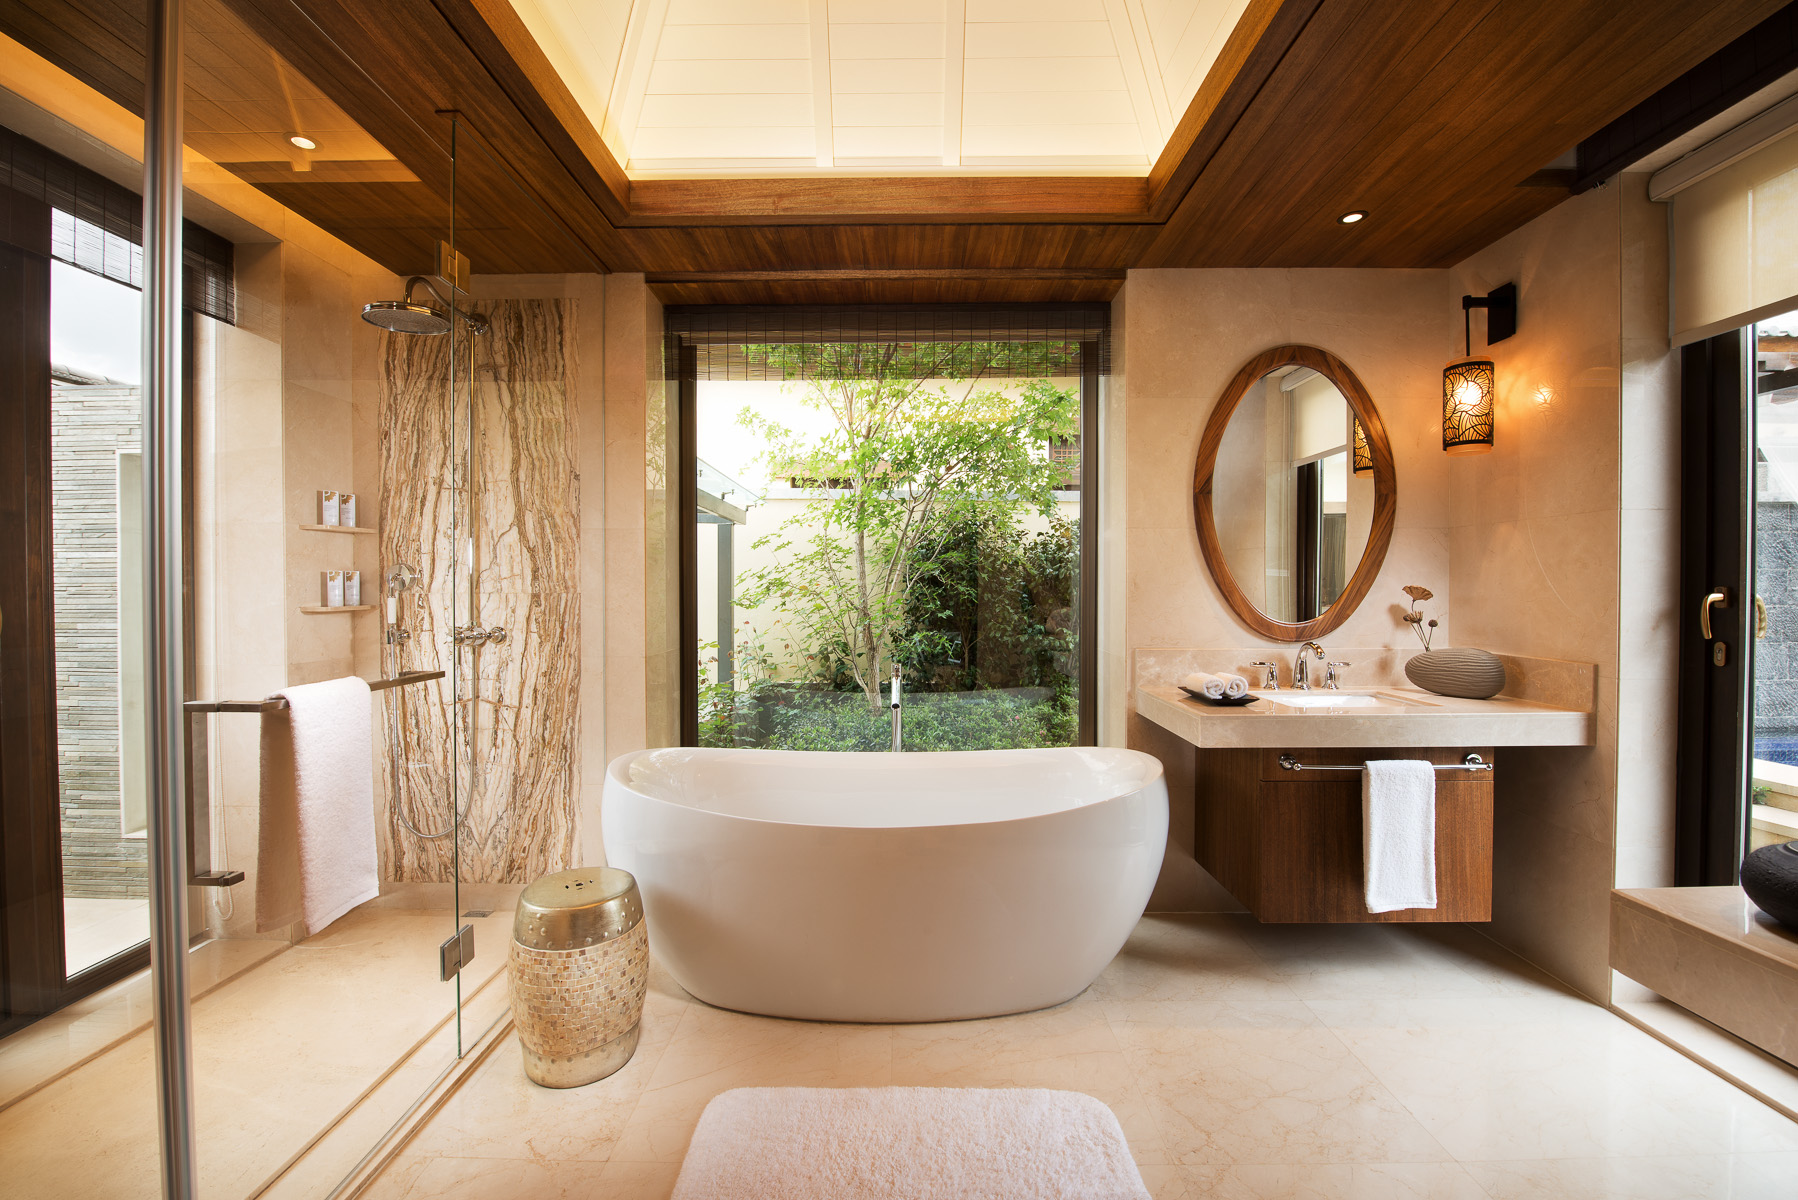 20140430_HBA_LiJiang-Villa_Shan-Qu_Bathroom_F3-2.jpg